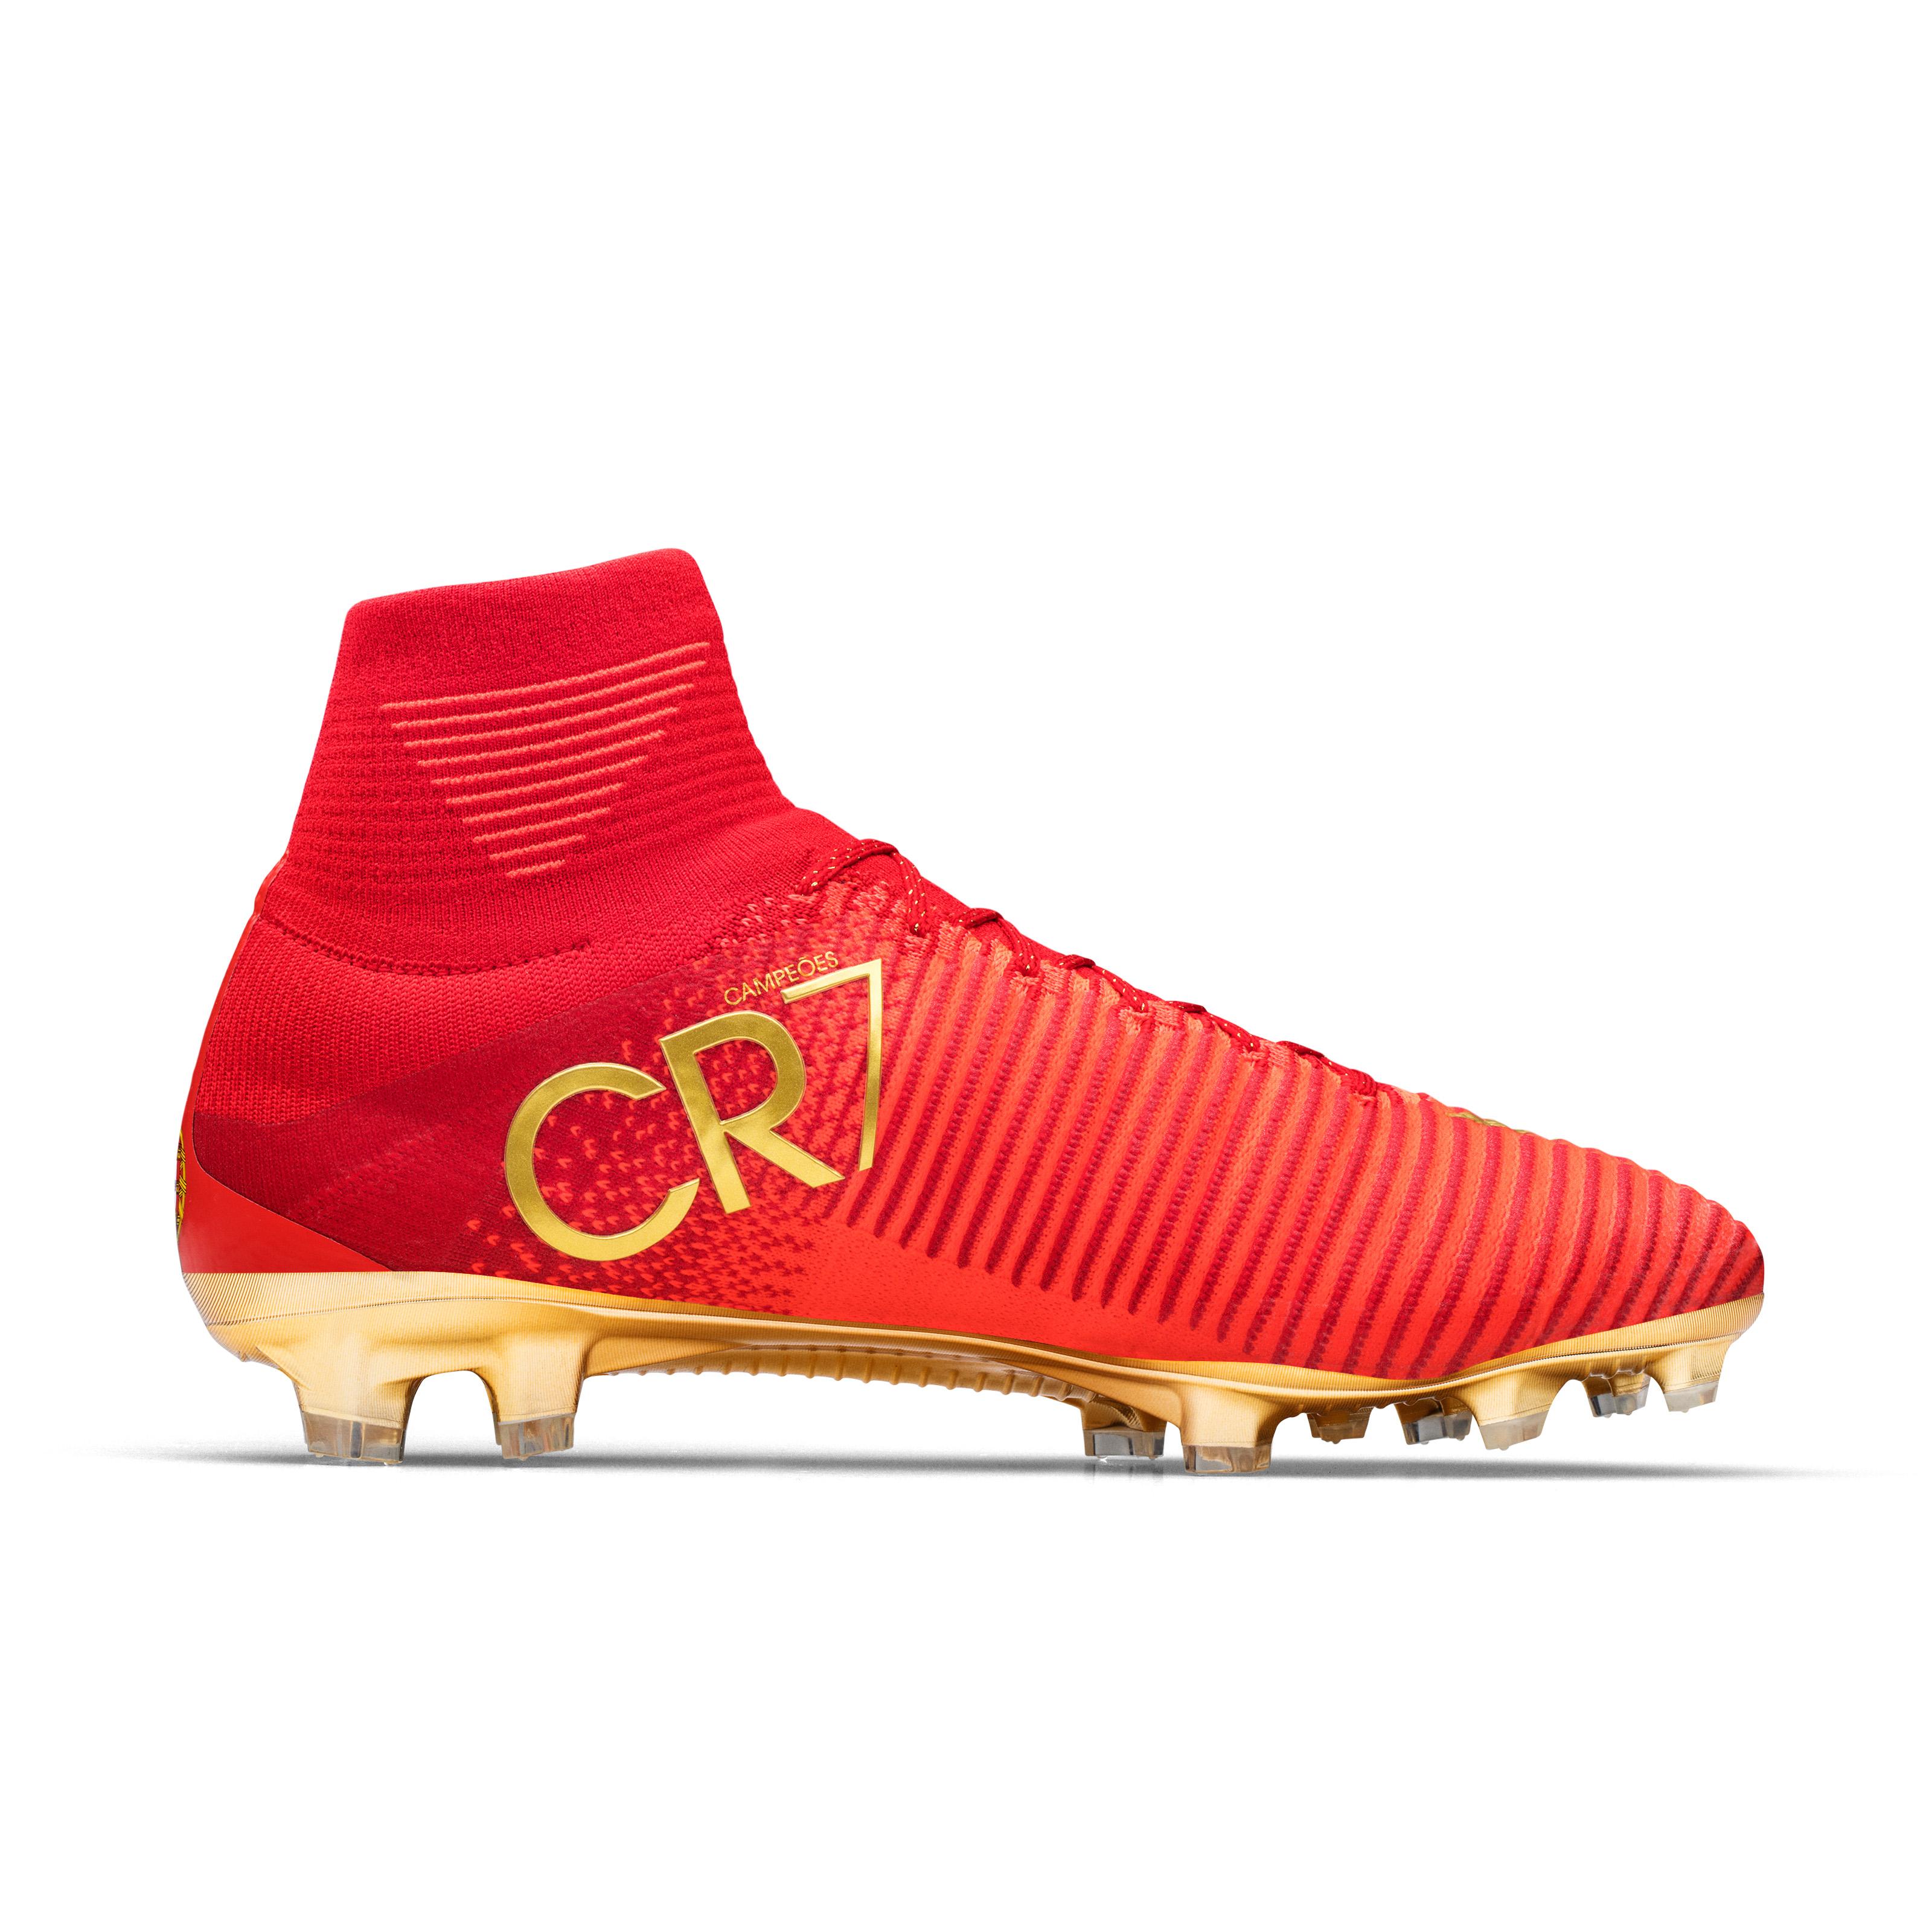 LO · HI. Special Portugal Boots for Cristiano Ronaldo: CR7 Mercurial ...